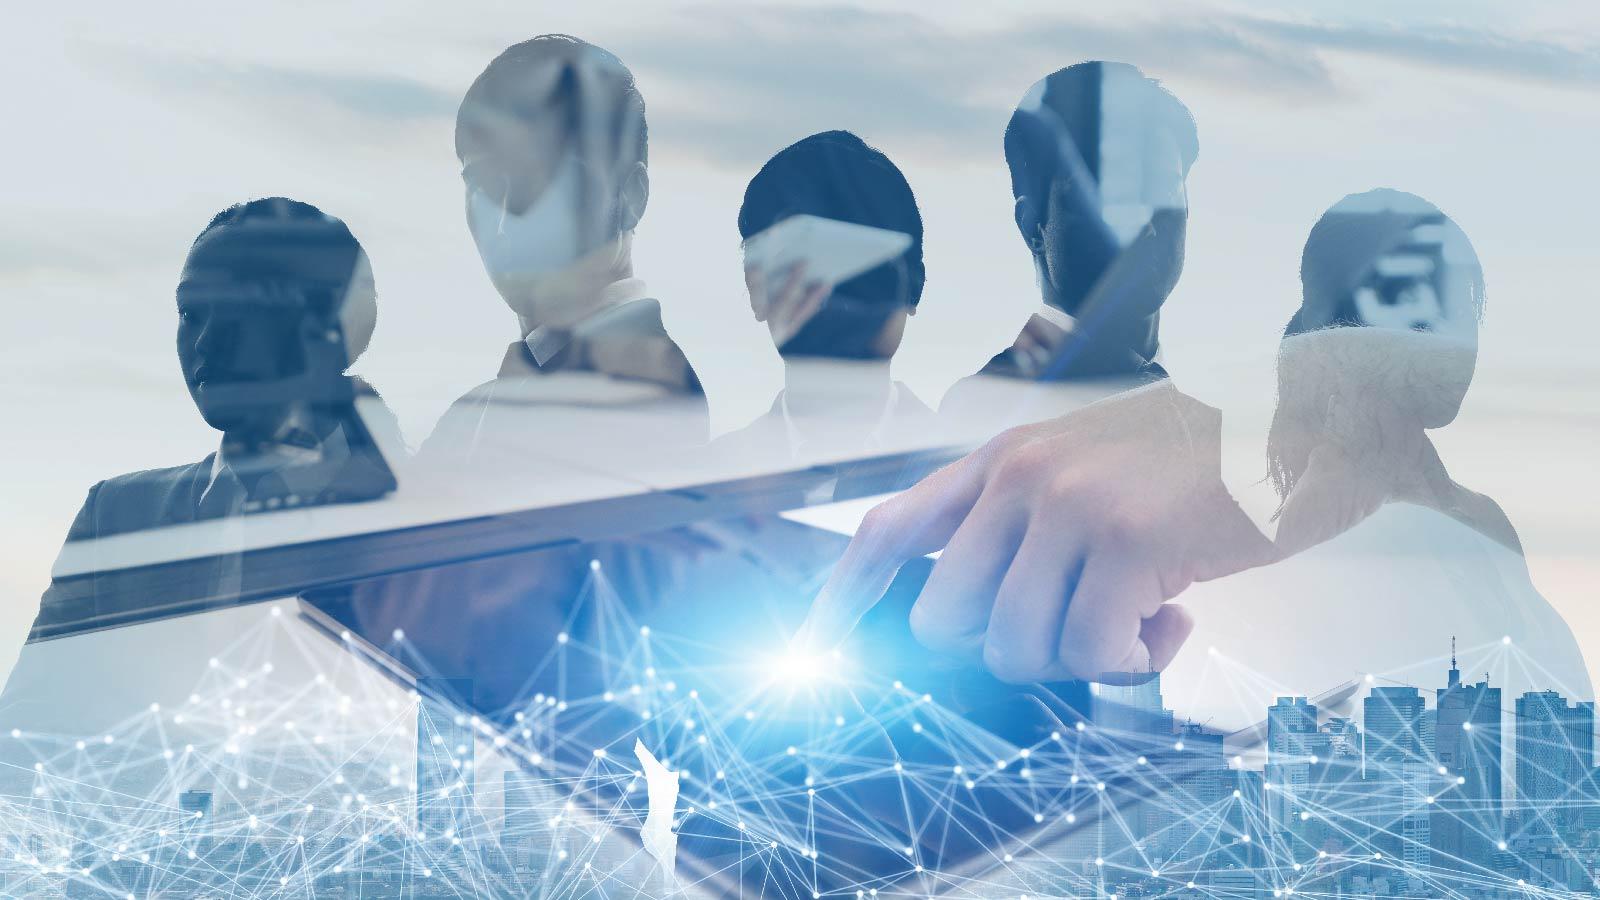 The Next-Gen Wireless BSS Market Has Enough Growth Prospects